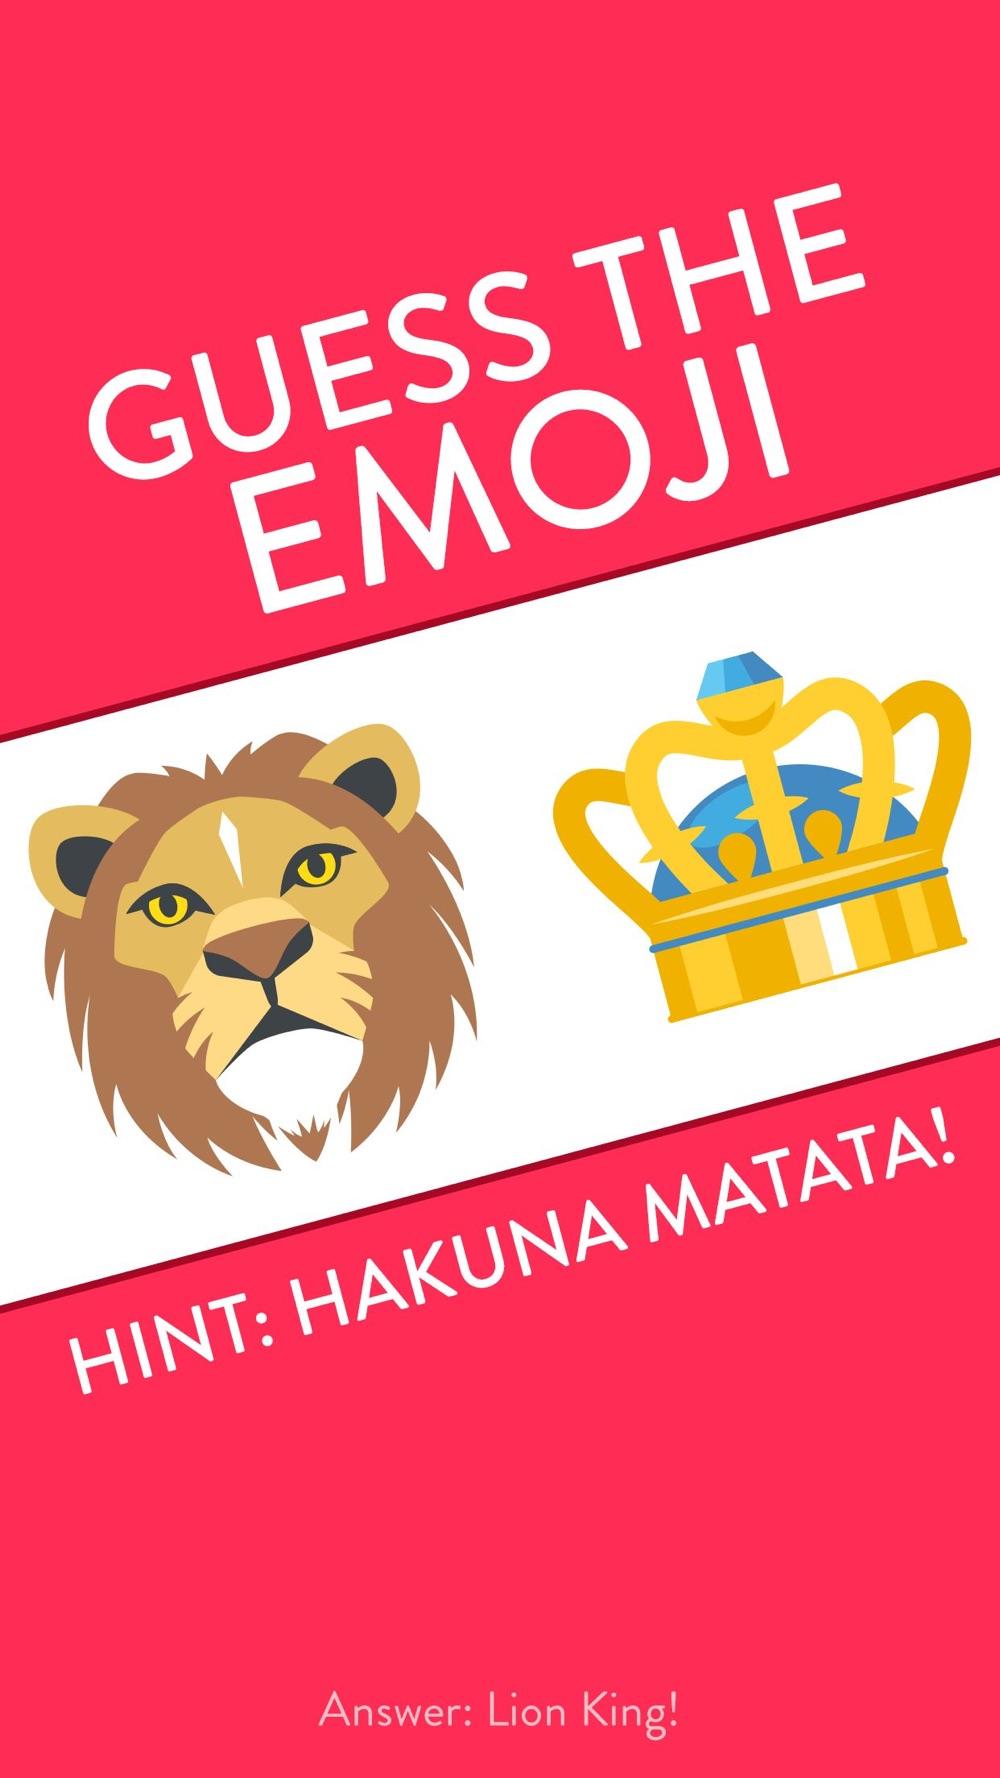 EmojiBrain – Guess The Emoji